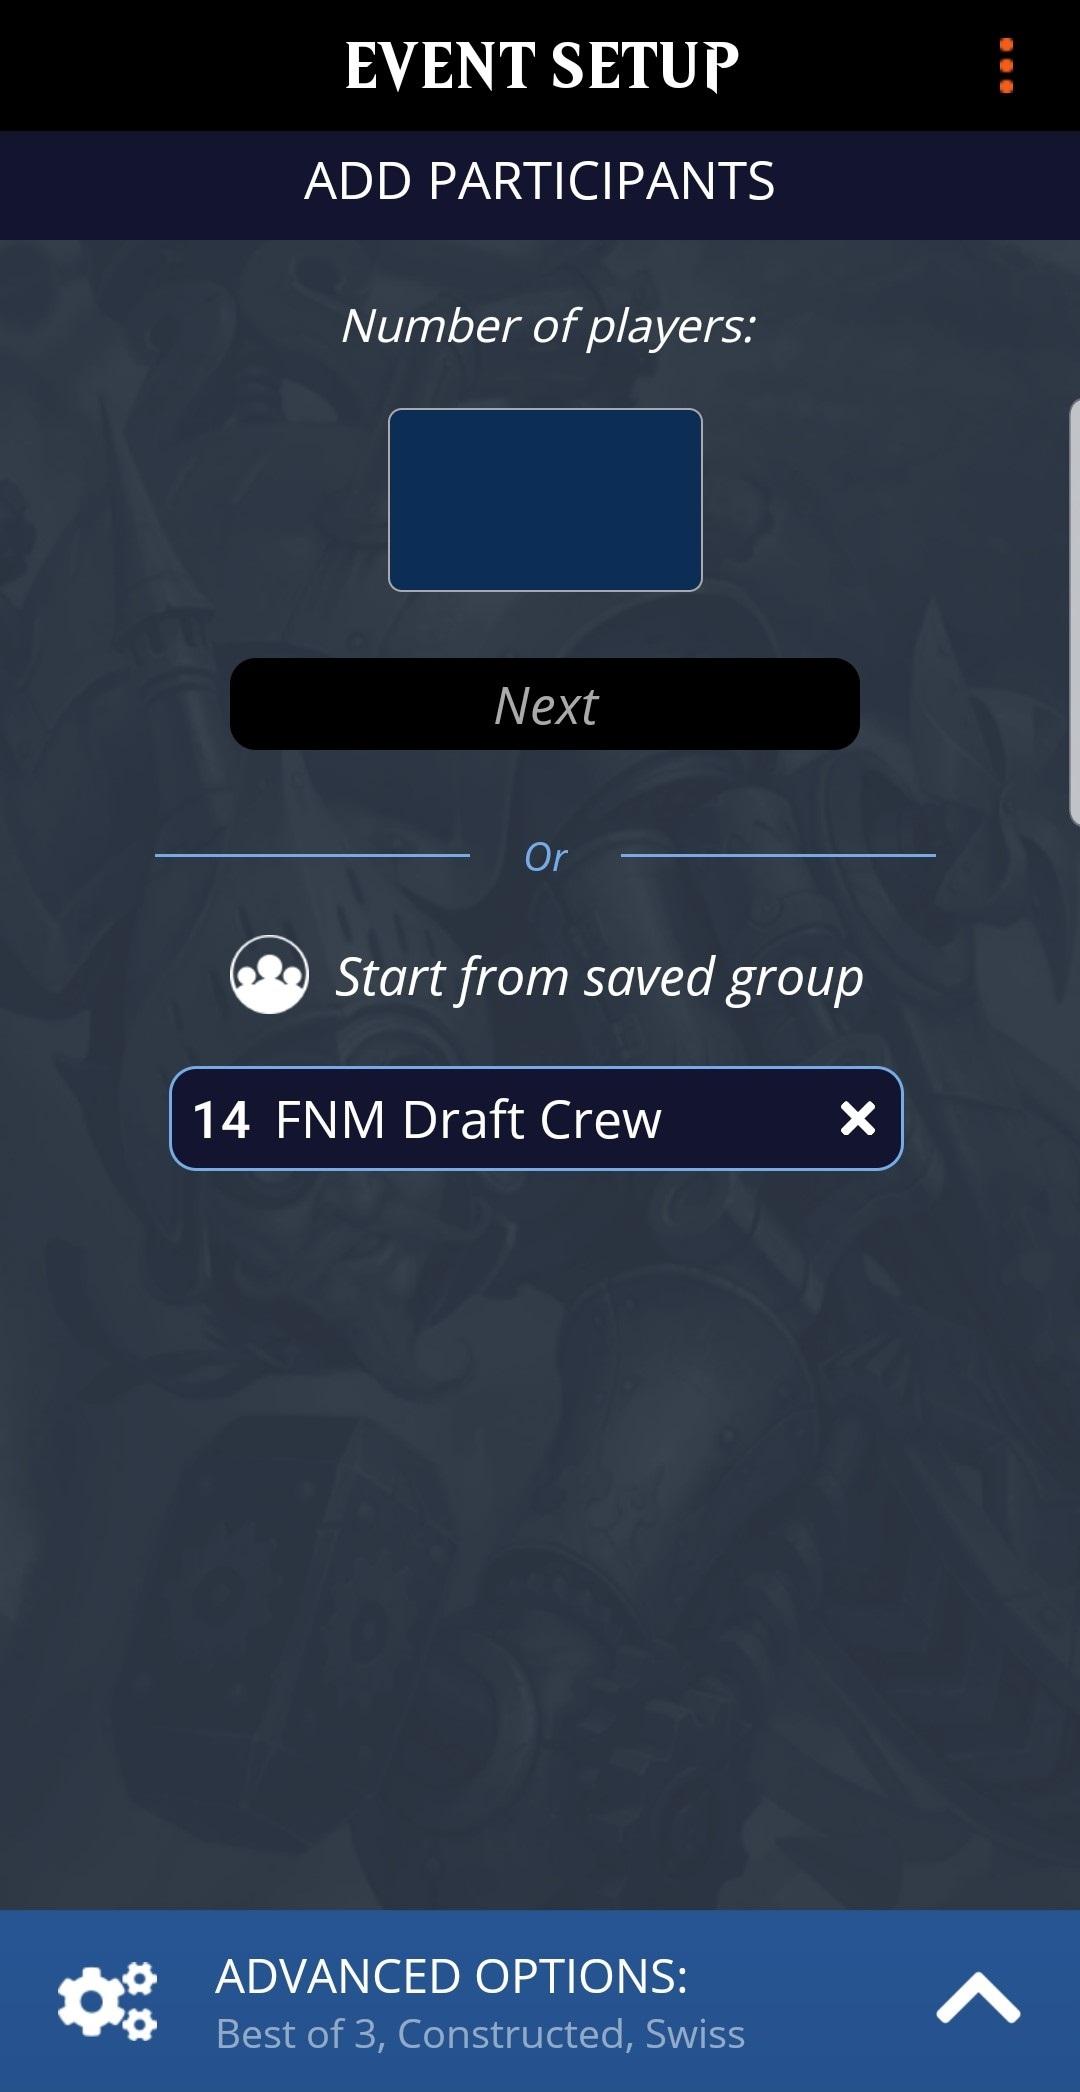 Save_Group_Home_Menu_Cropped.jpg